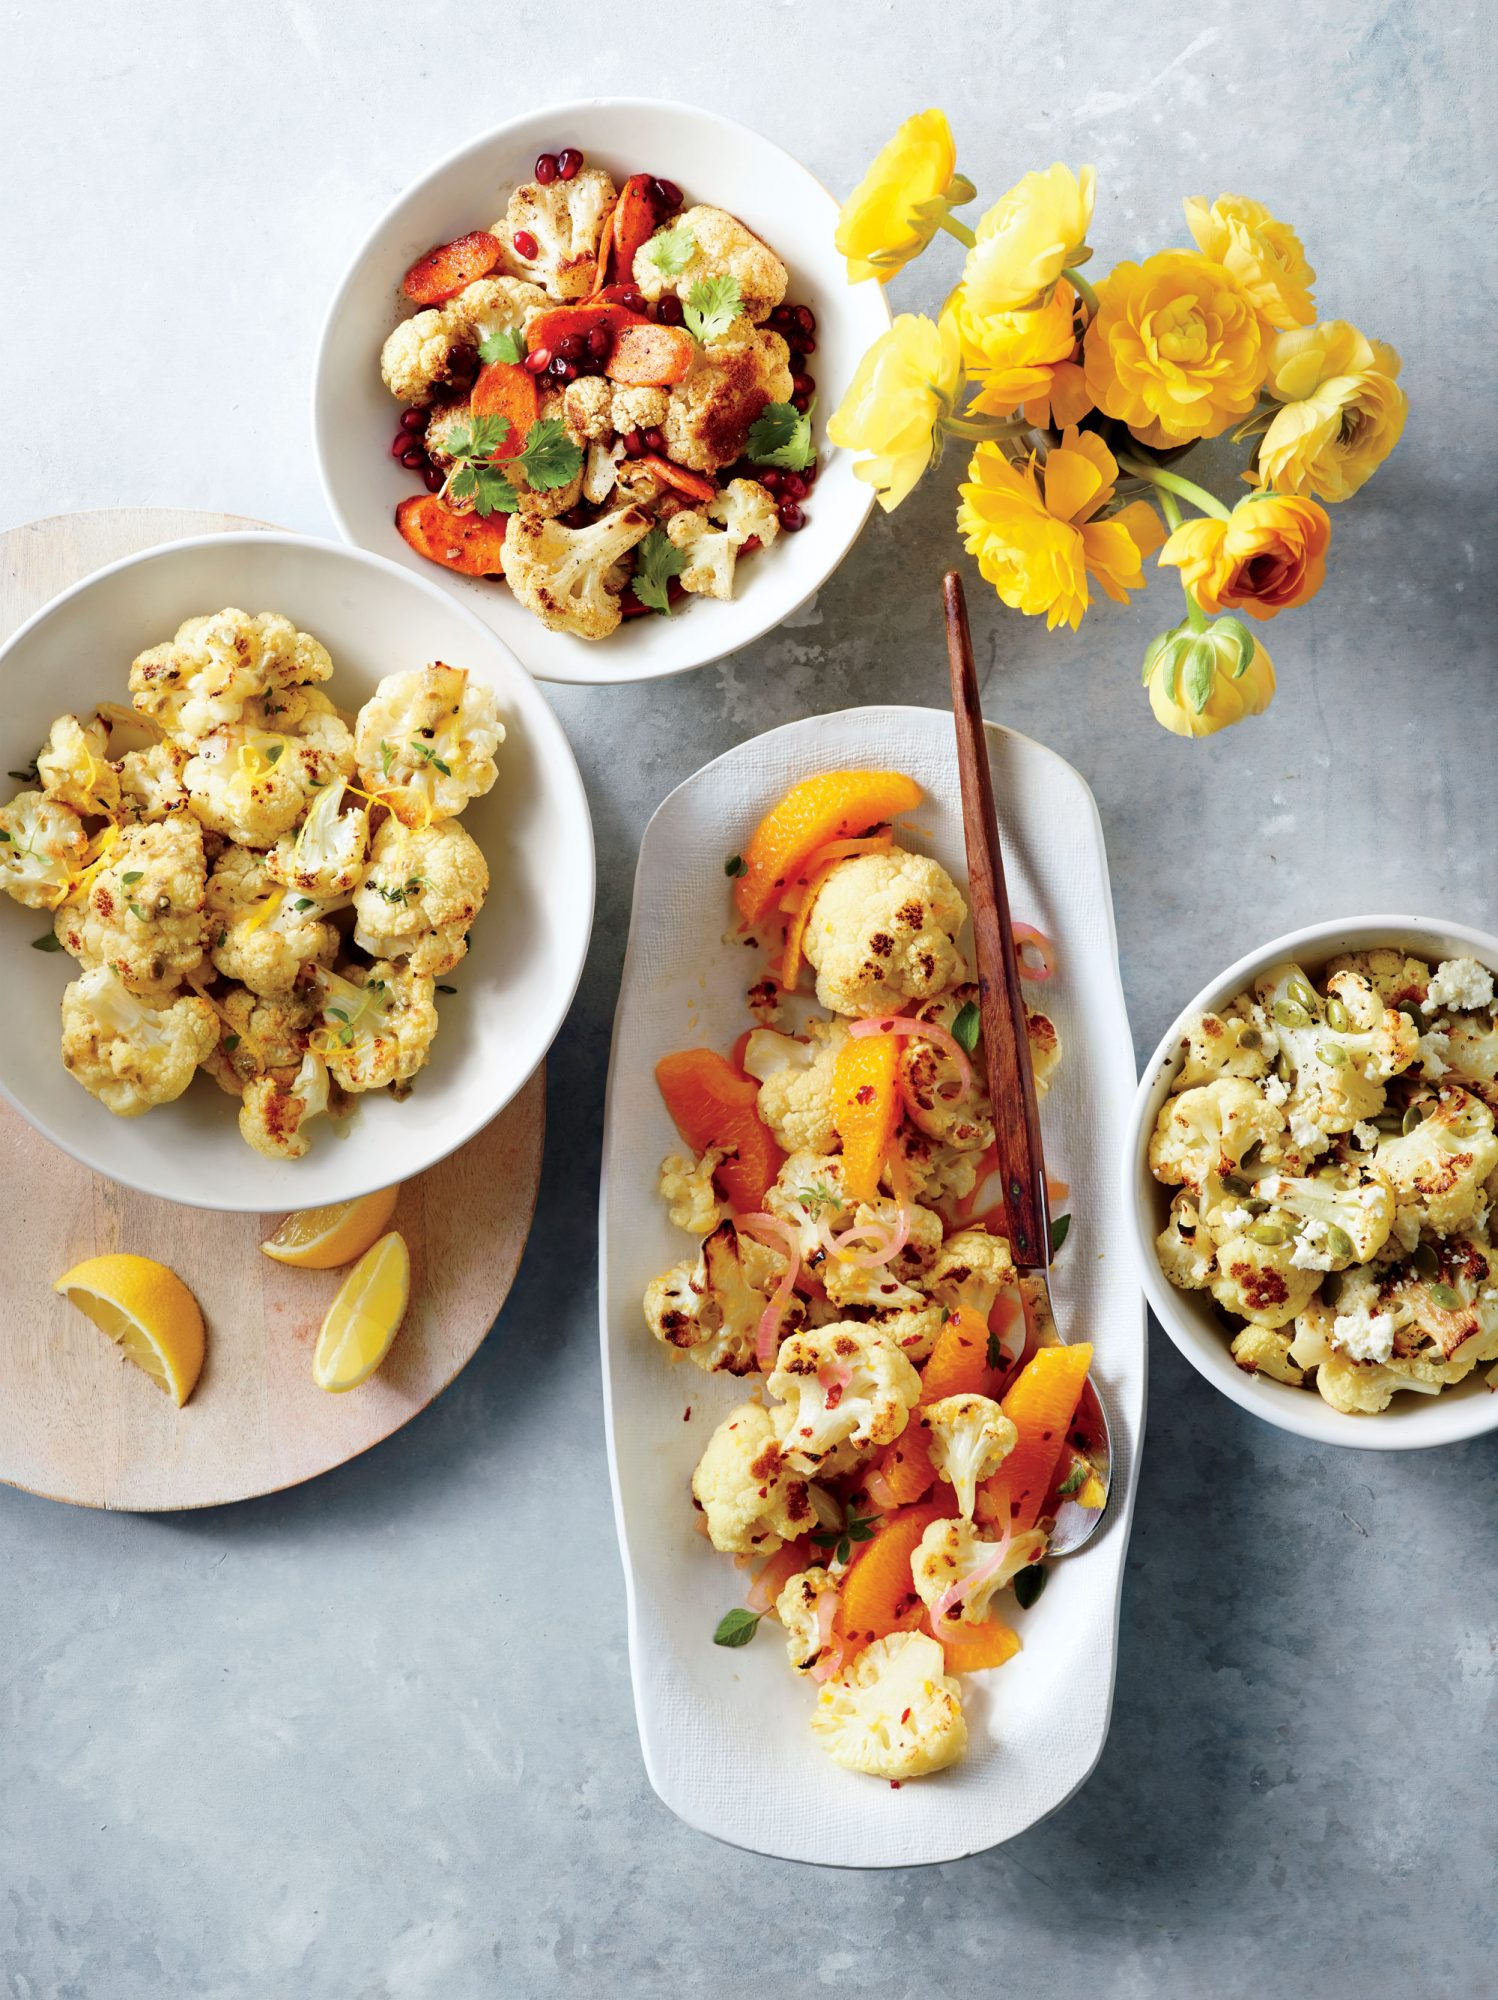 Roasted Cauliflower with Lemon-Caper Vinaigrette image